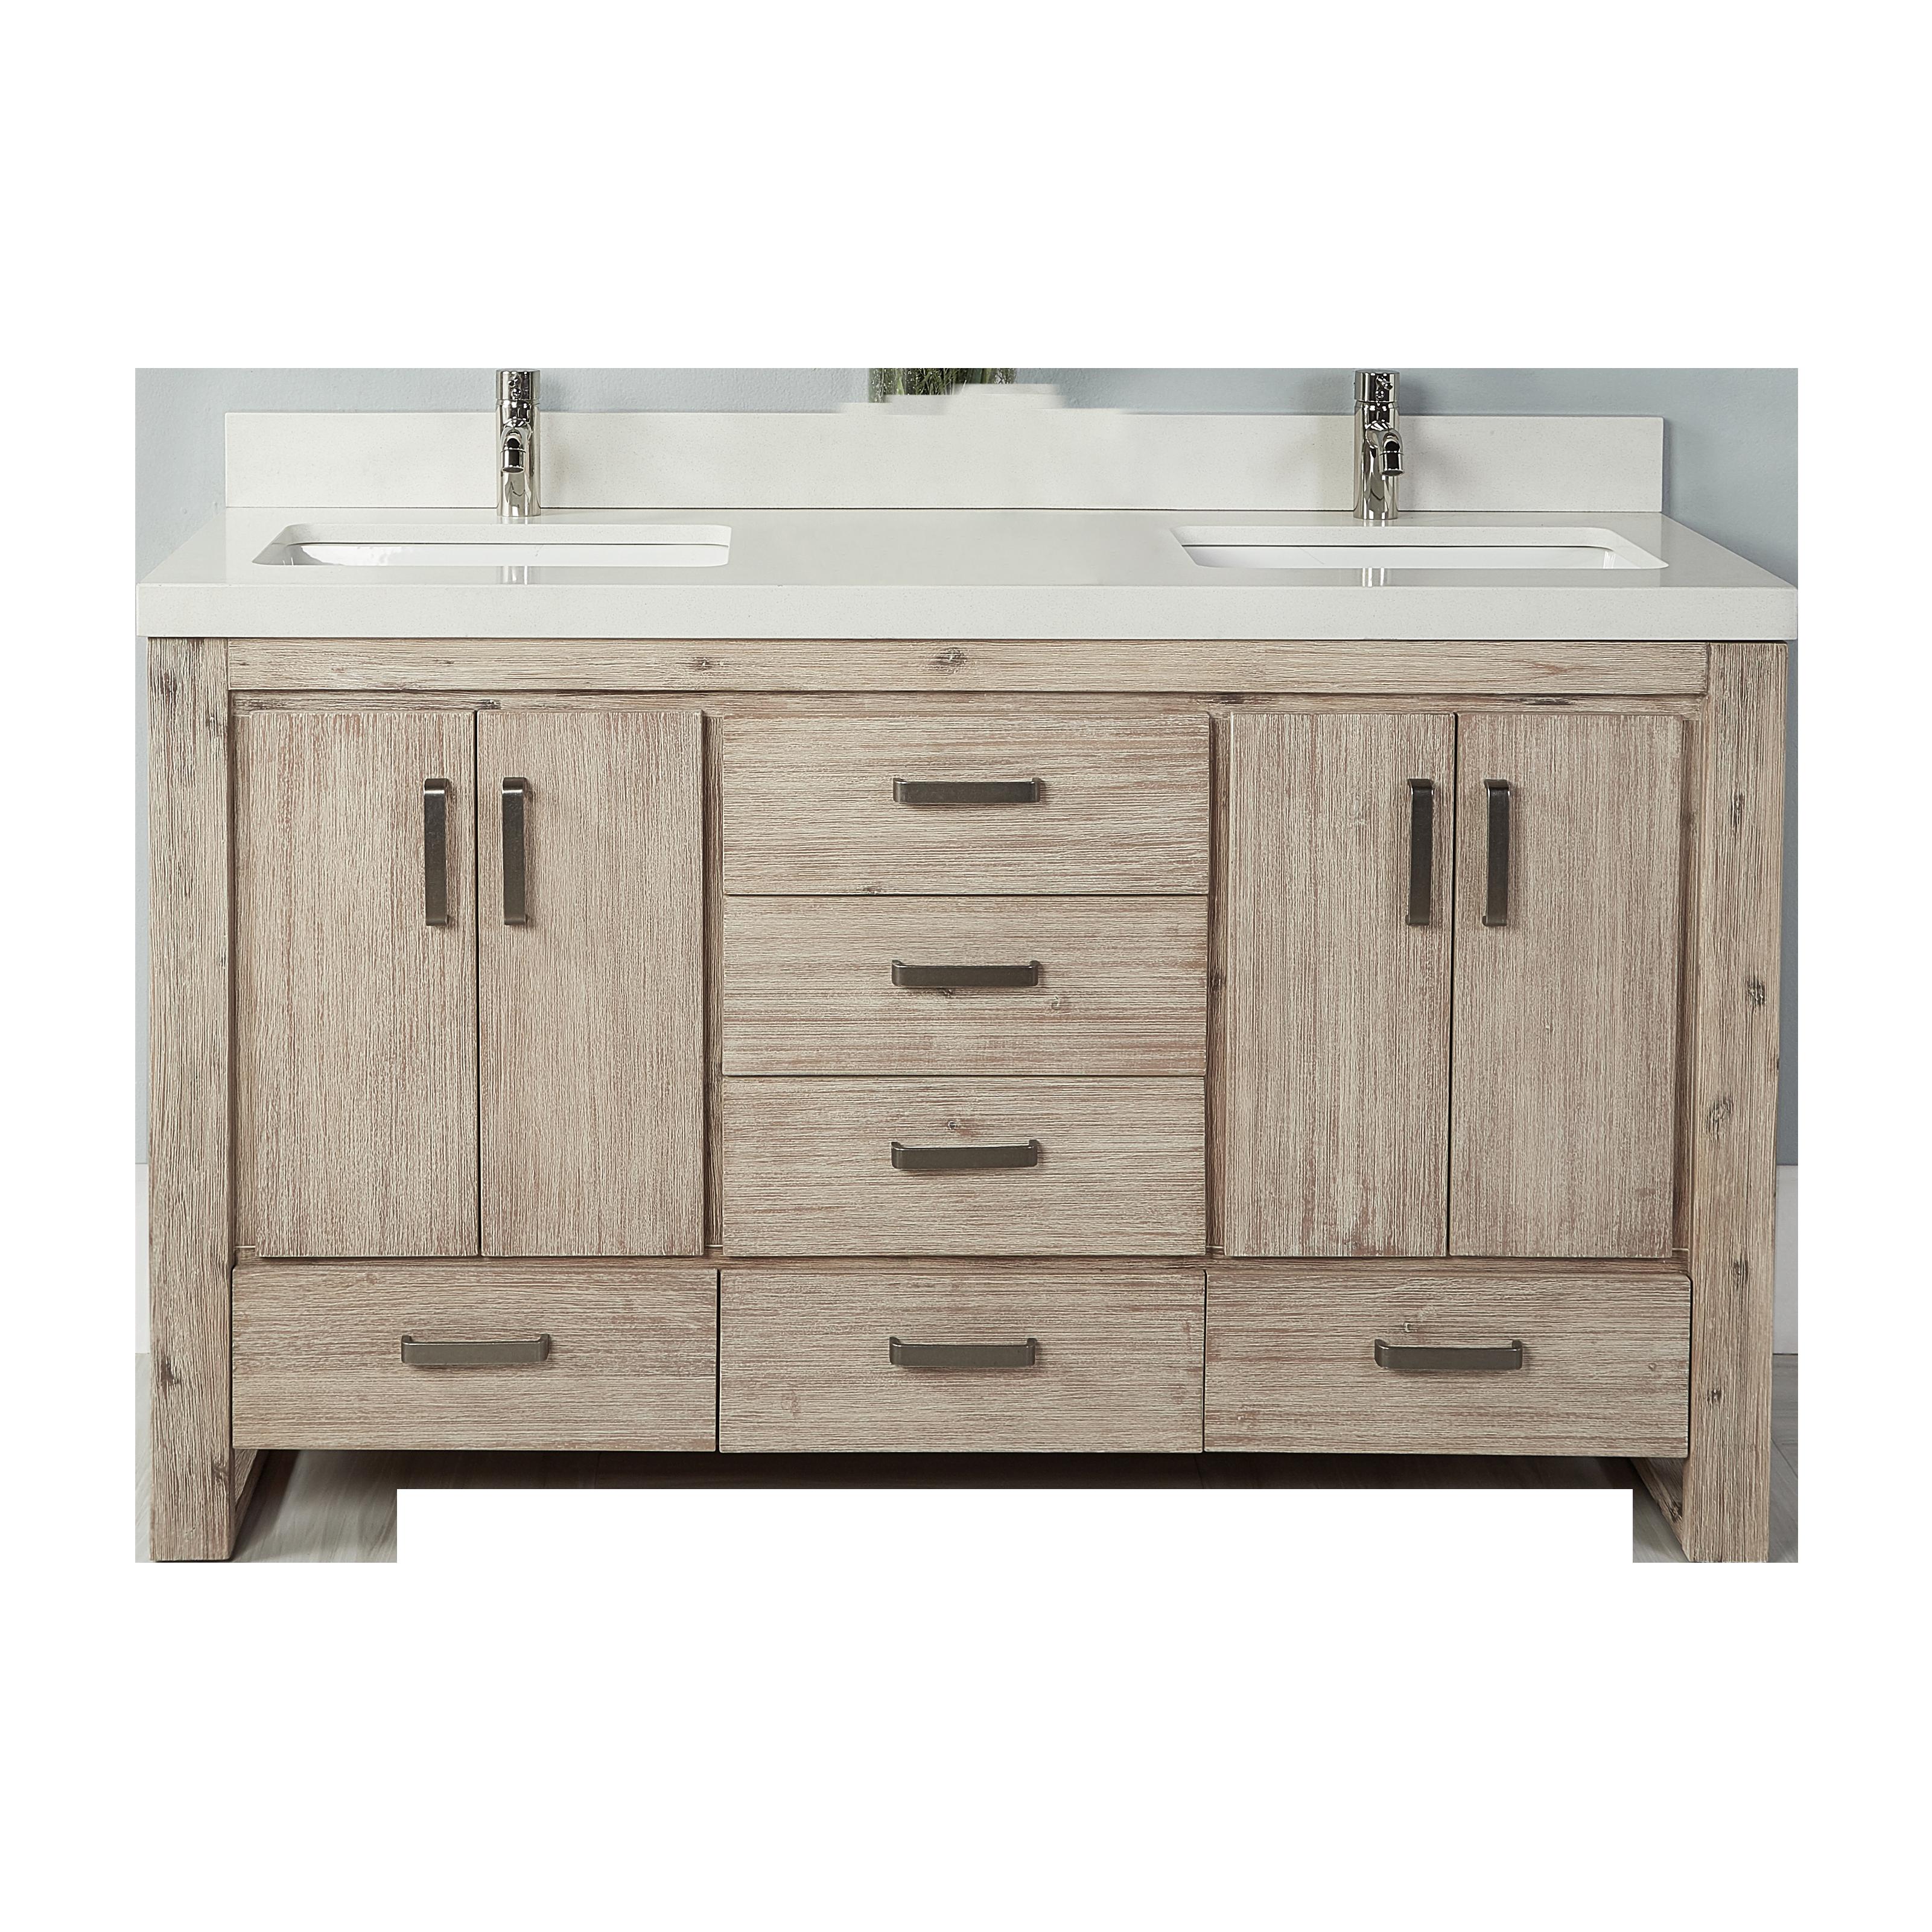 Fairmont Designs 1530-V6021D Oasis Bathroom Vanity | QualityBath.com